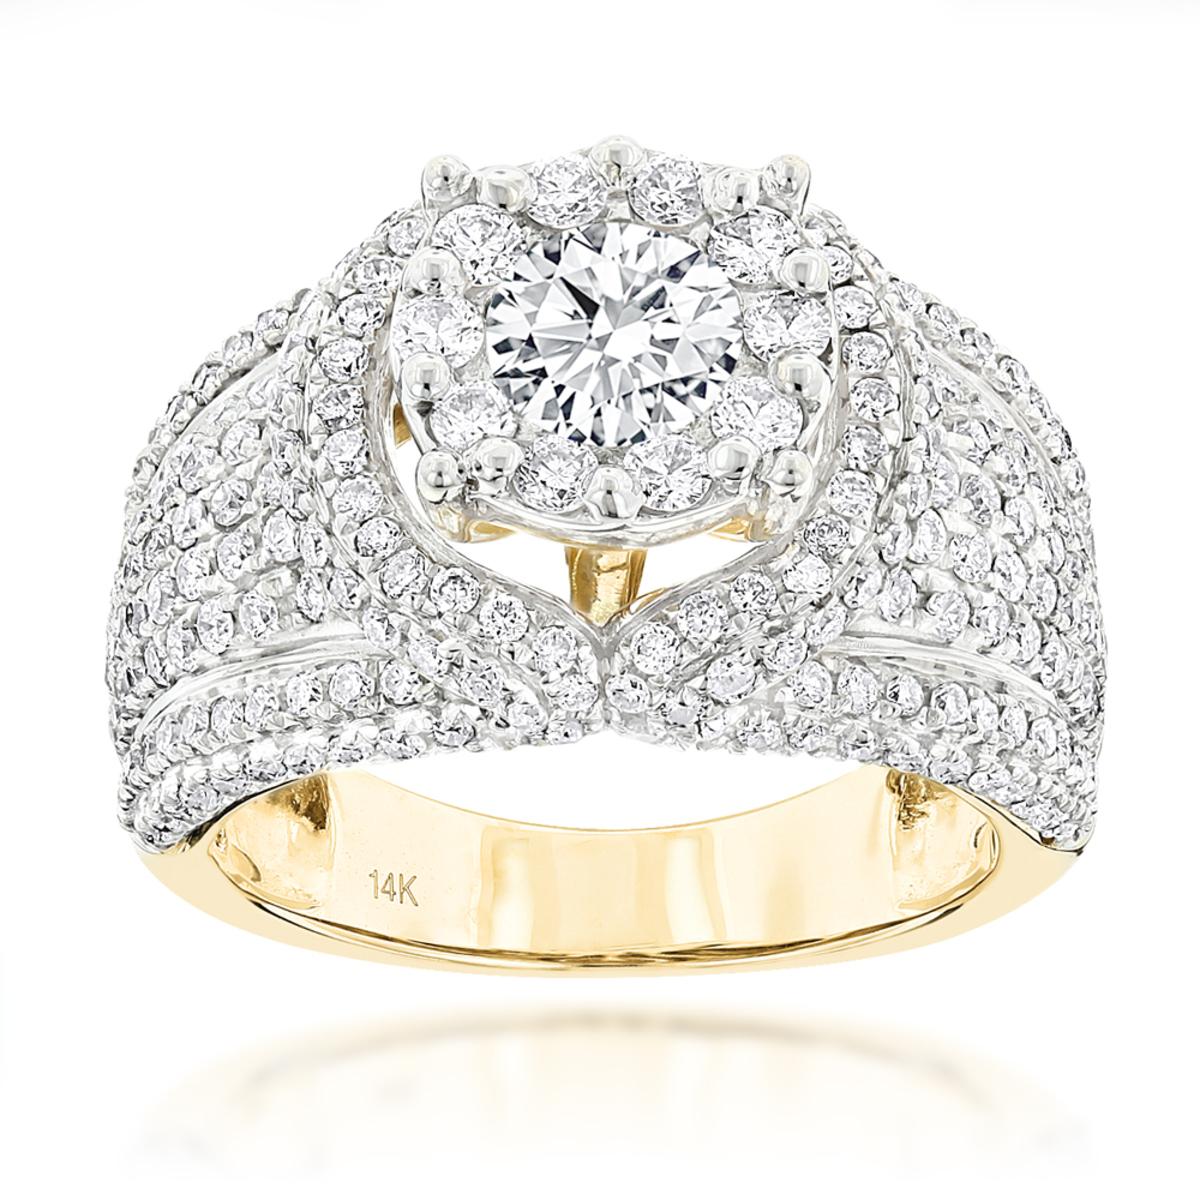 Unique Luxury 14K Gold Diamond Engagement Ring 2.79ct